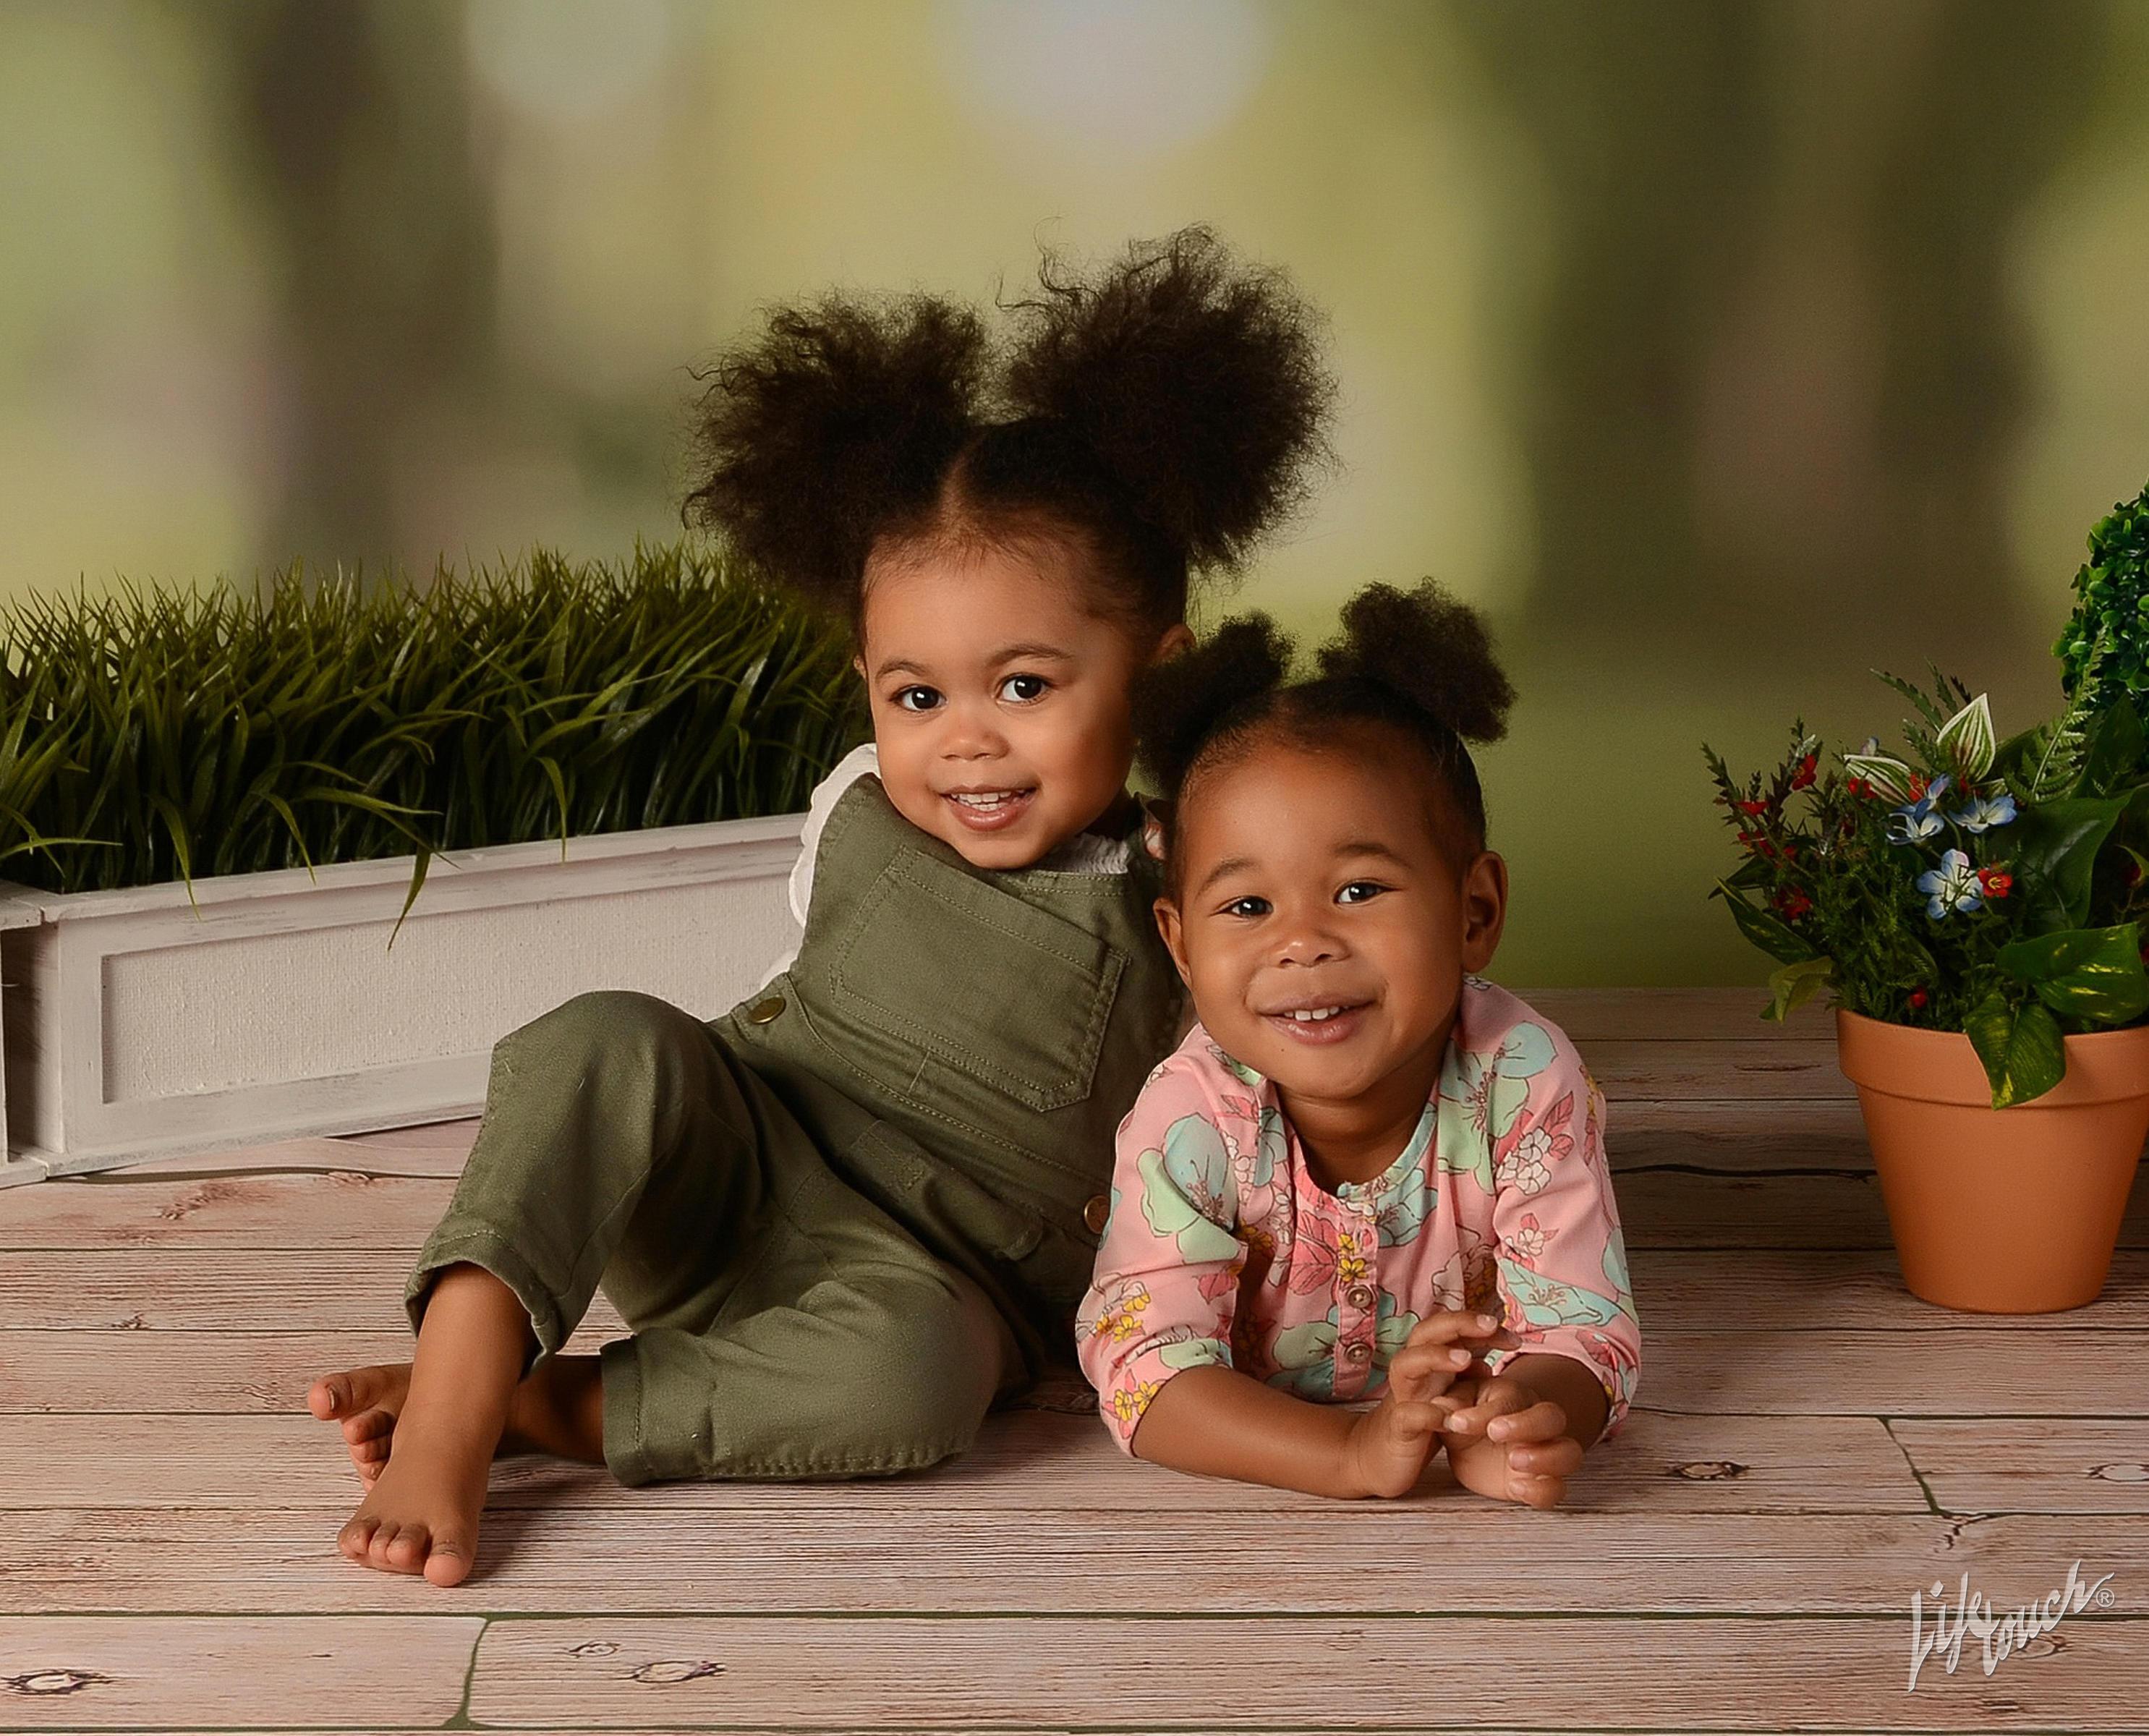 Lifetouch Preschool Photography - Sales Representative image 4